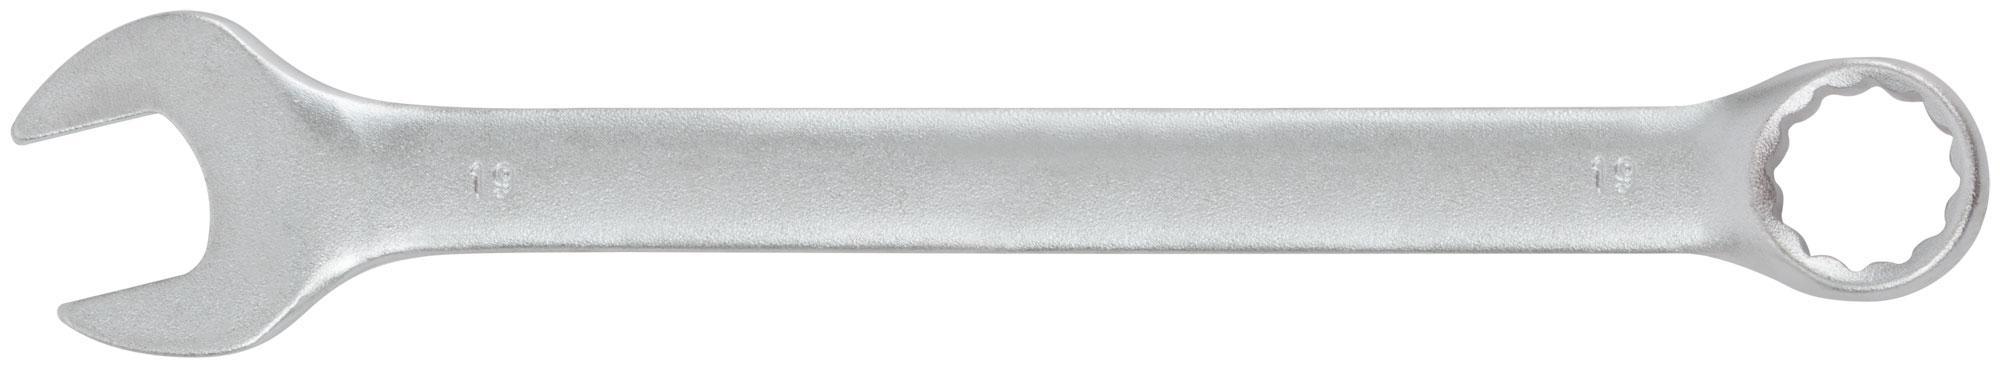 Ключ гаечный комбинированный Fit 63259 (19 мм) ключ комбинированный kraft 14 мм кт 700508